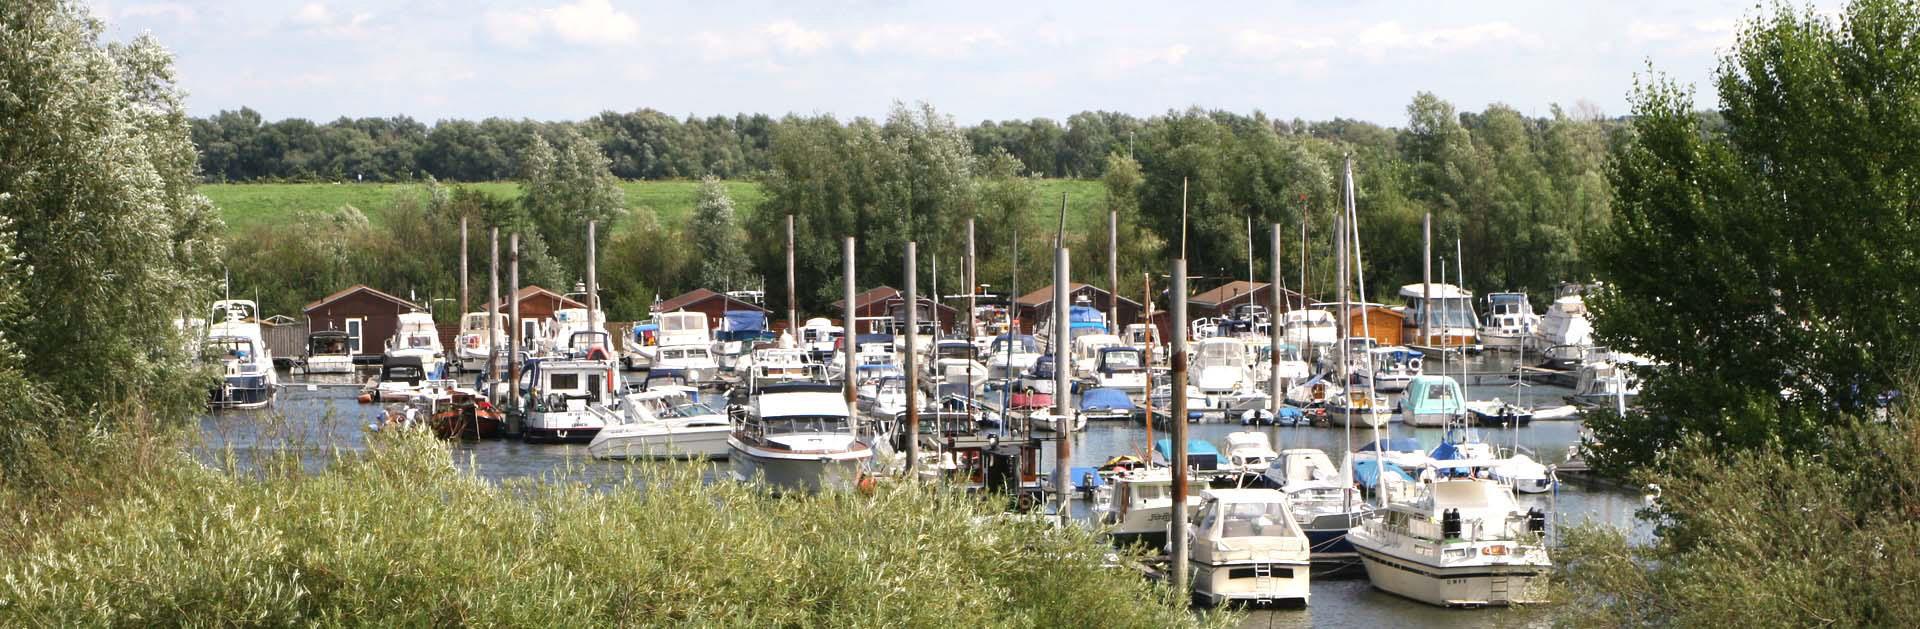 Jachthavens Achterhoek - Liemers